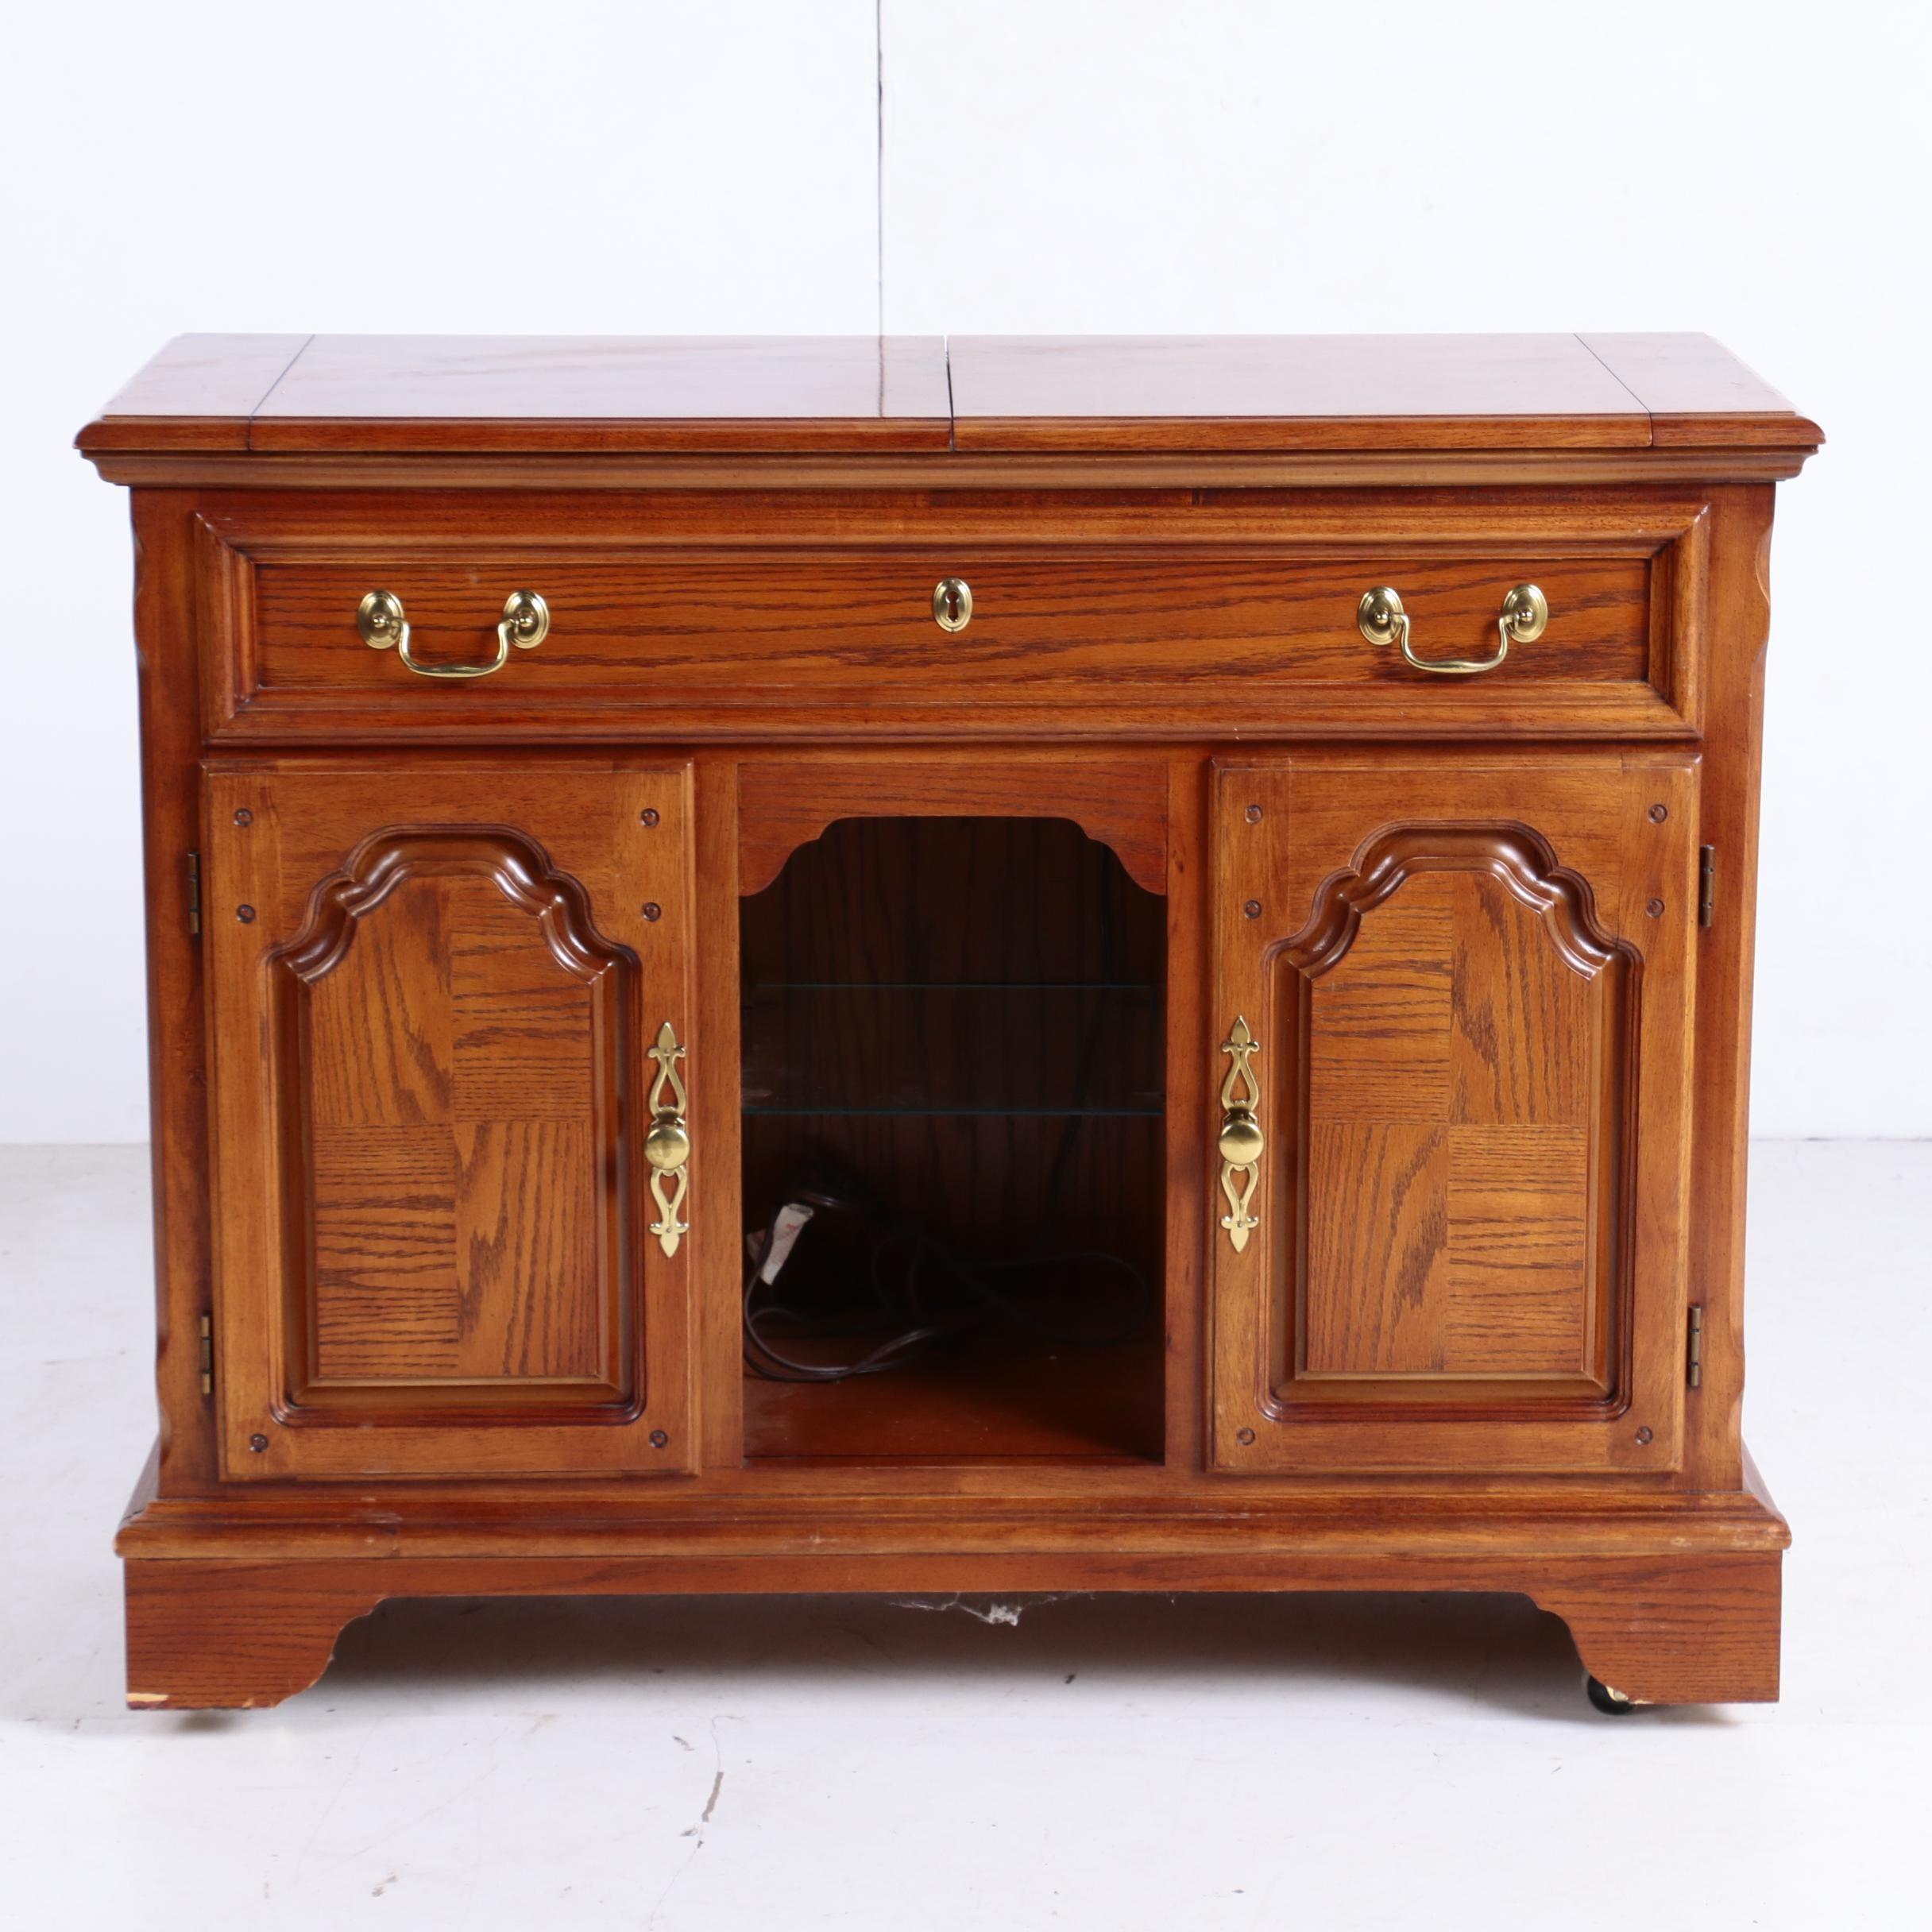 George III Style Oak-Veneered Flip-Top Server by Lexington, 20th Century